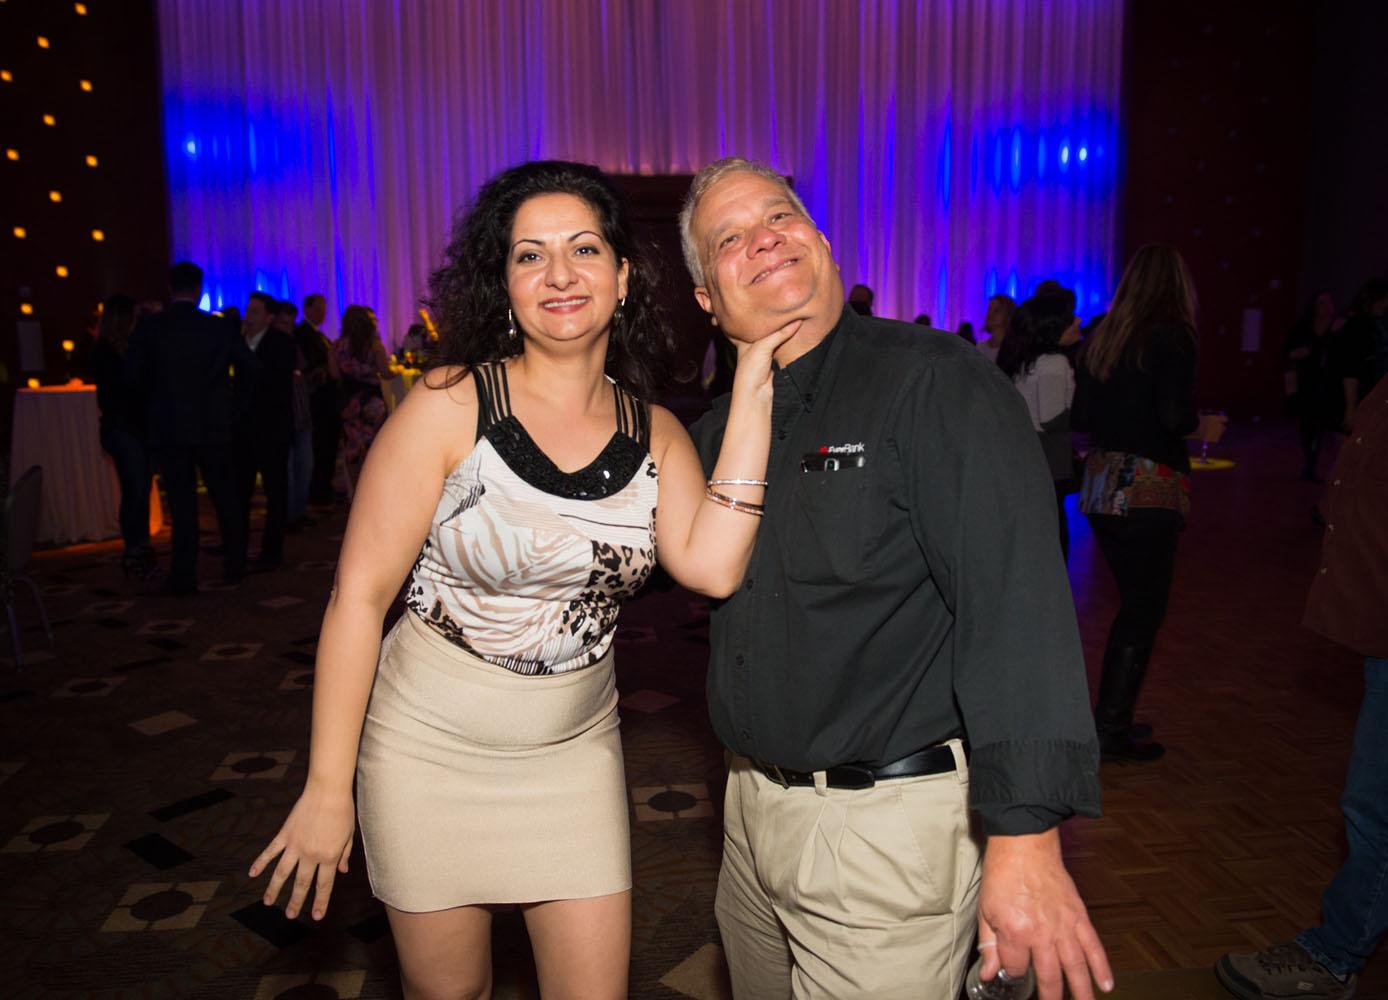 2015-12-09 ReMax Corpoarte Event - The Borgata - Atlantic City NJ - Photo Sesh - 2015-5125.jpg